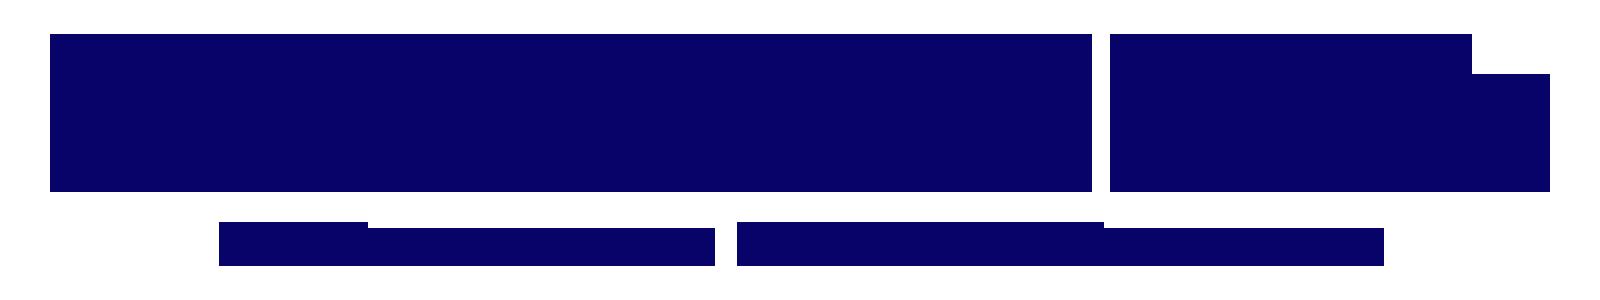 Value Domain Rates